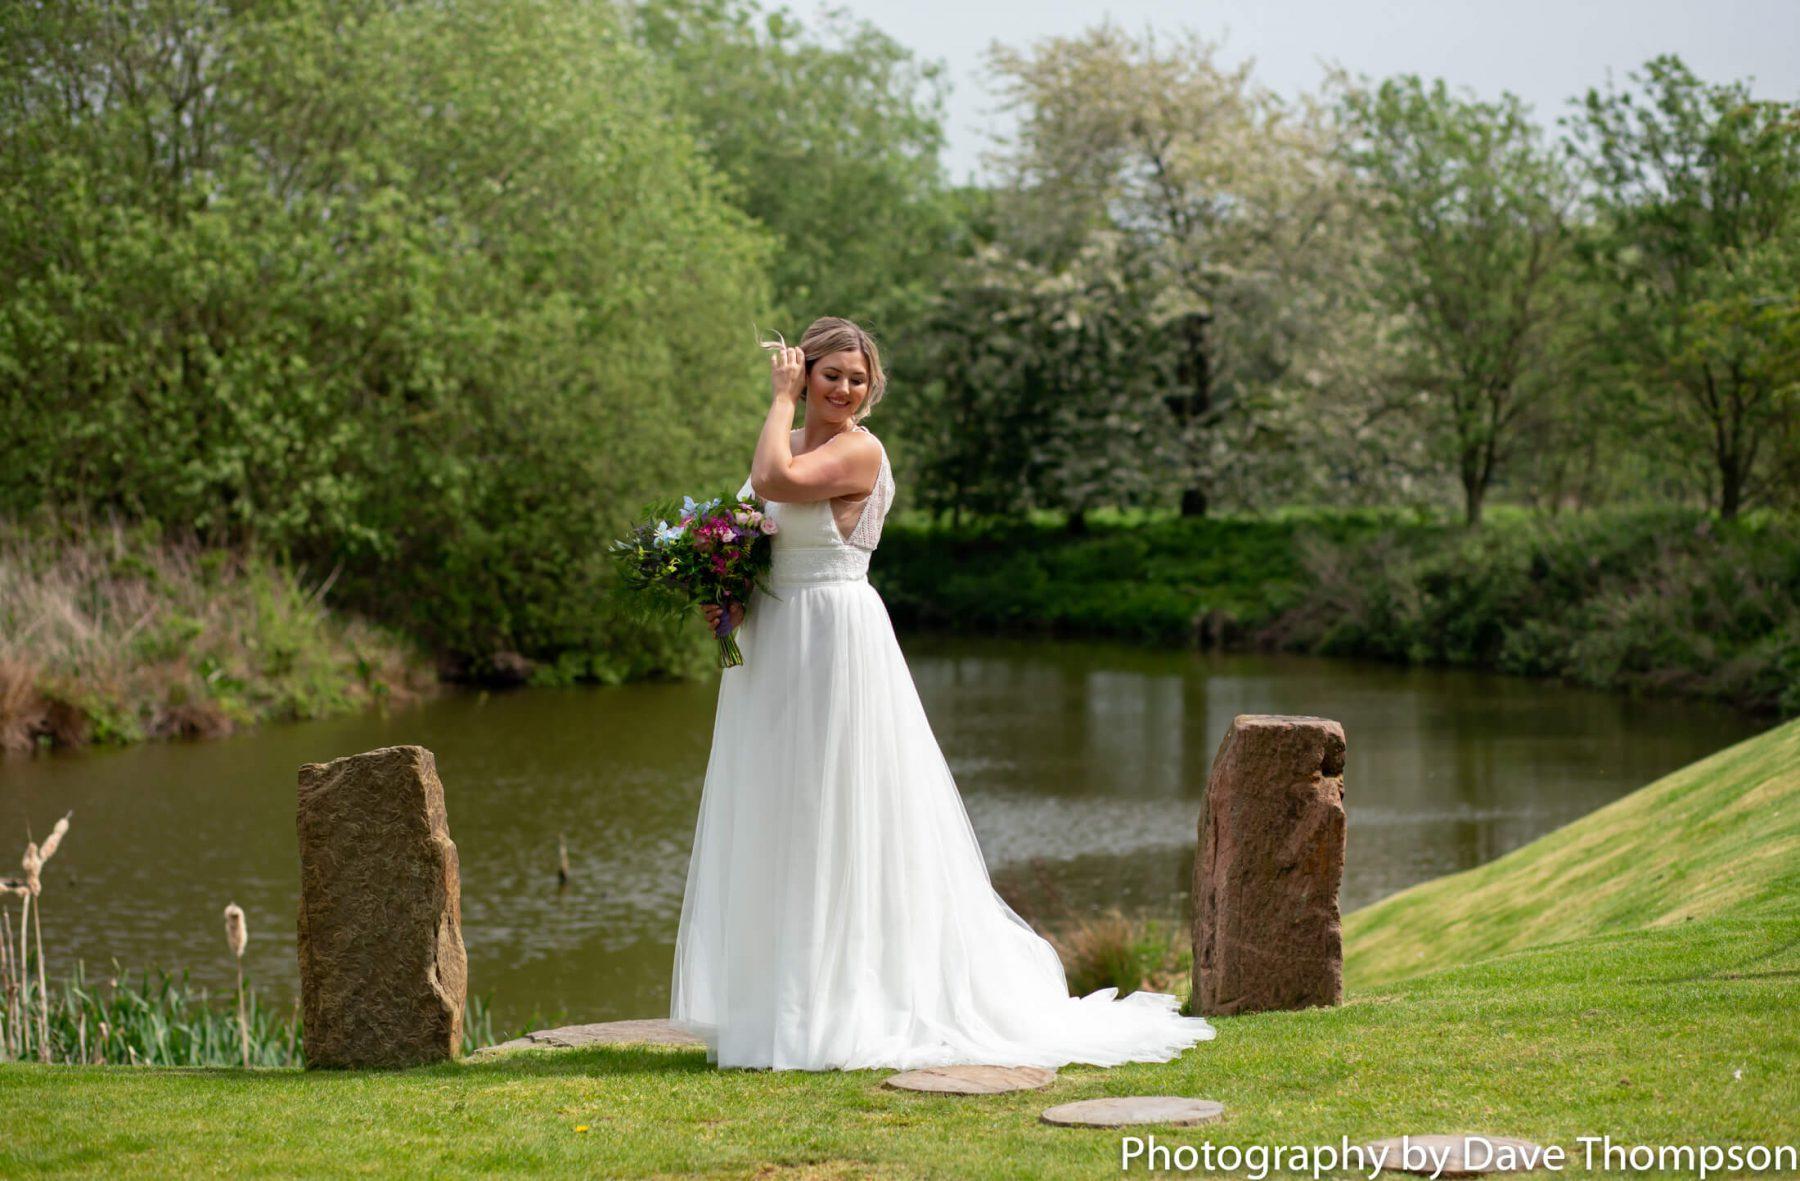 Bridal portrait by the lake at Alcumlow Barn wedding venue